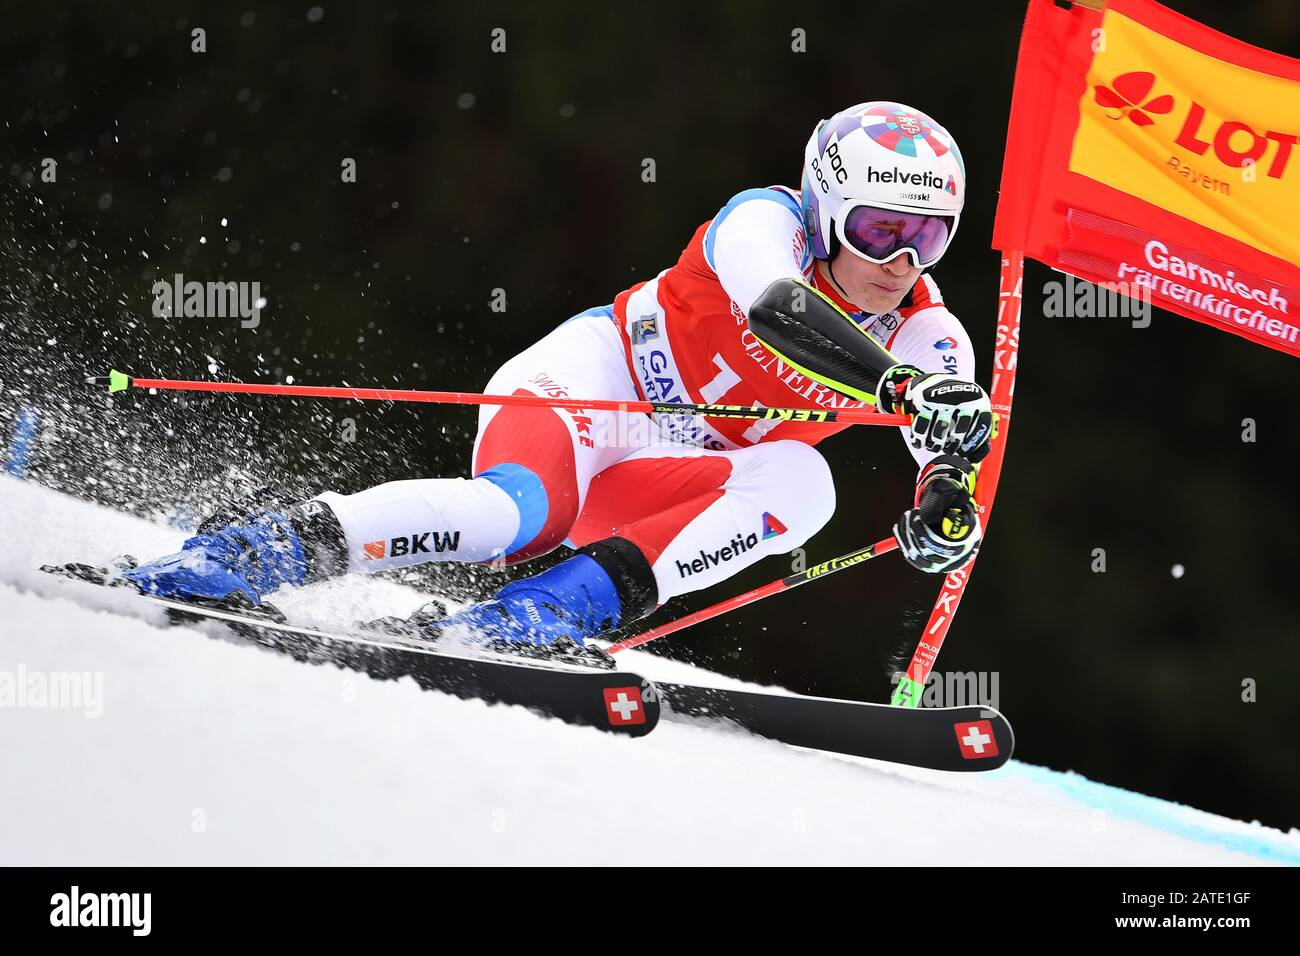 Marco ORMATT (SUI), action. Alpine skiing: men's giant slalom/Kandahar race in Garmisch Partenkirchen on 02.02.2019. | usage worldwide Stock Photo